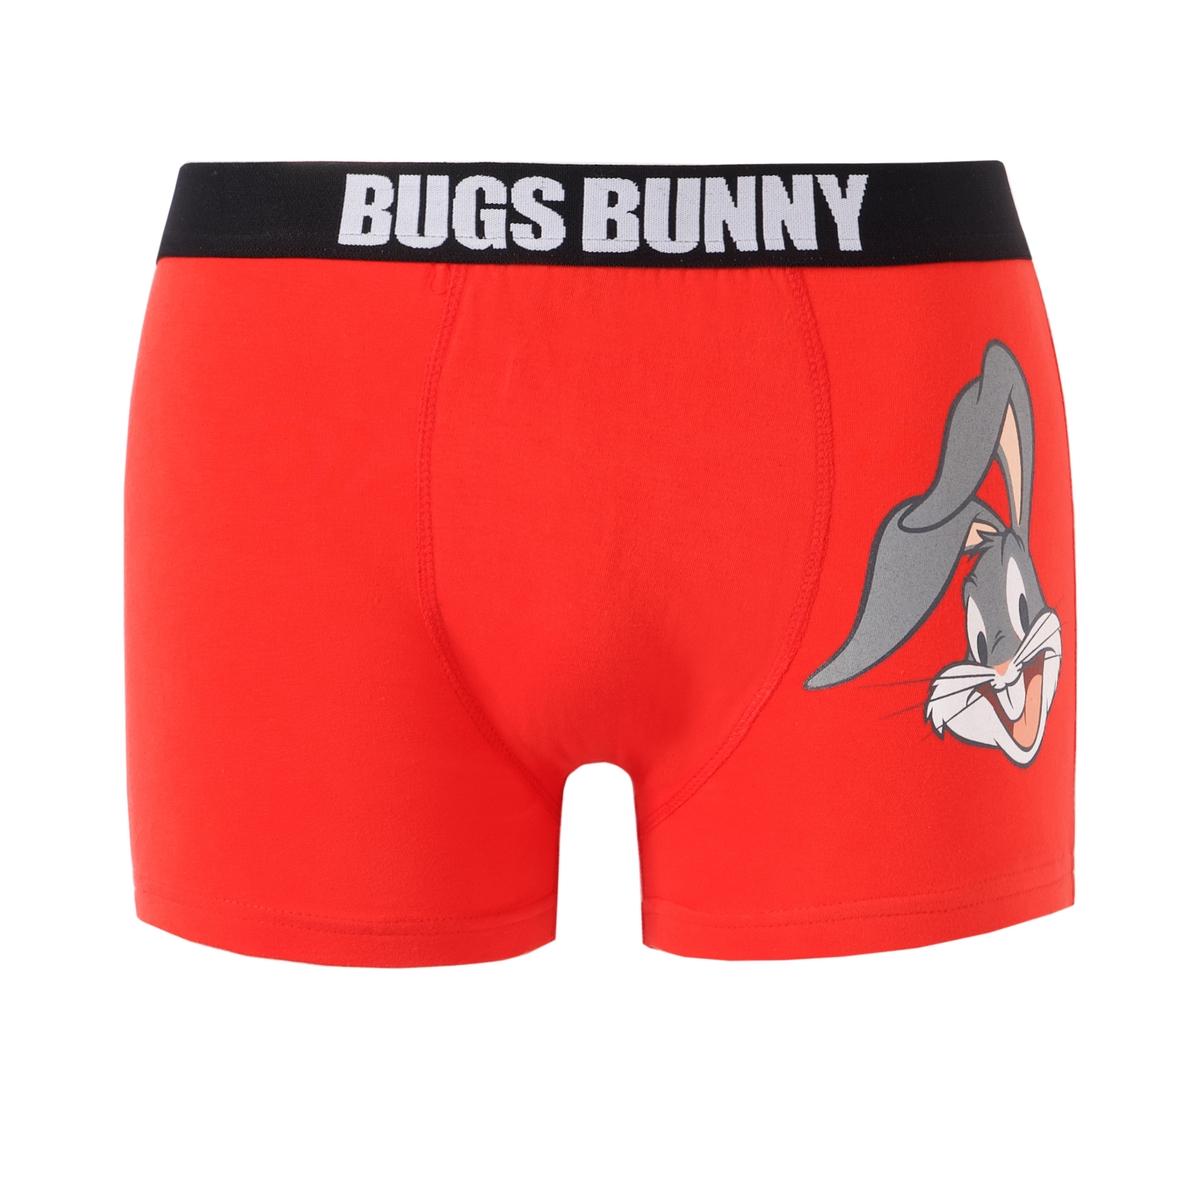 Трусы-боксеры  Bugs Bunny